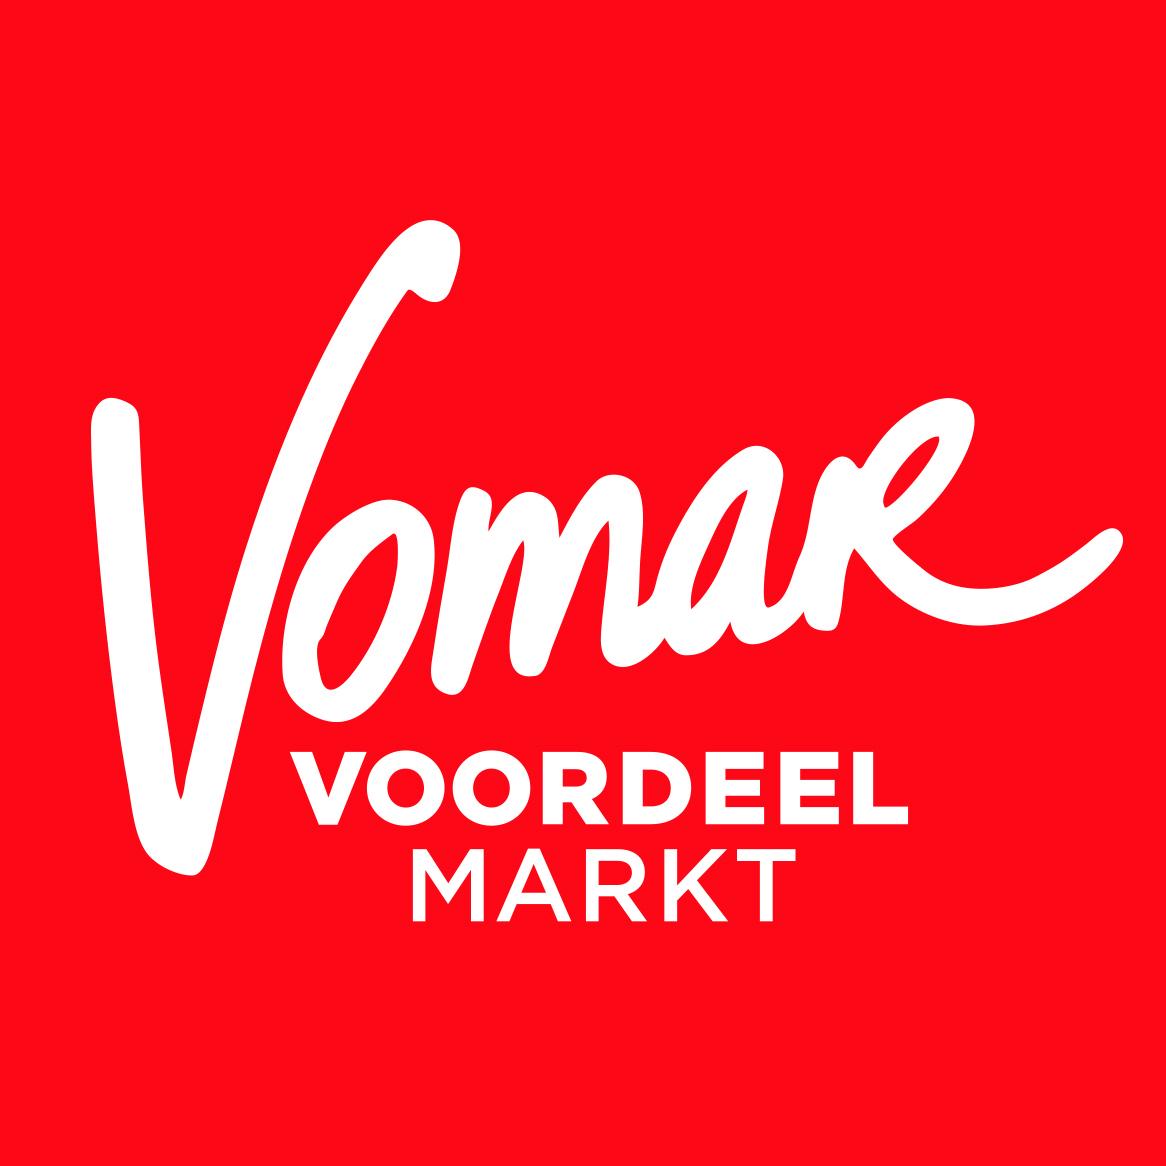 Vomar Club is Koning actie